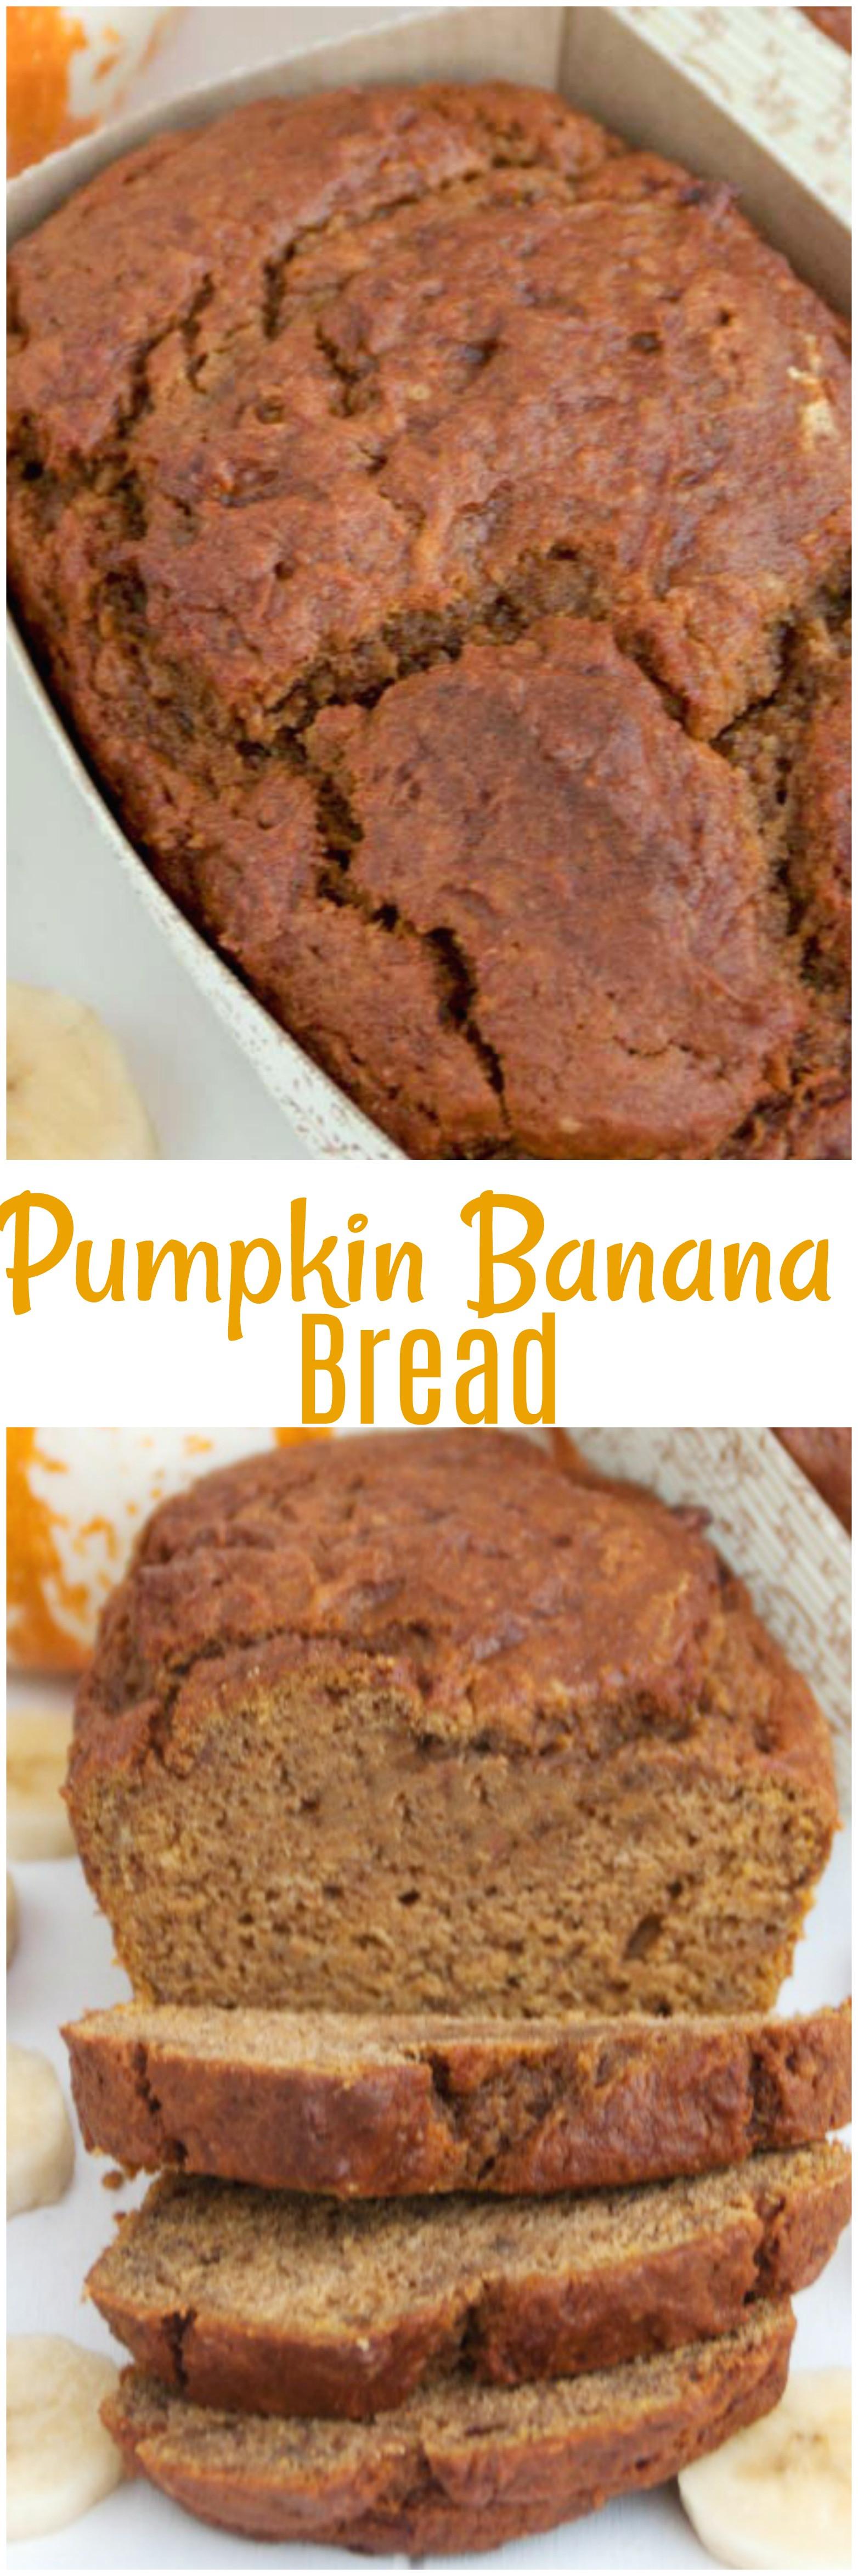 Banana Pumpkin Bread  Pumpkin Banana Bread • Mid Momma